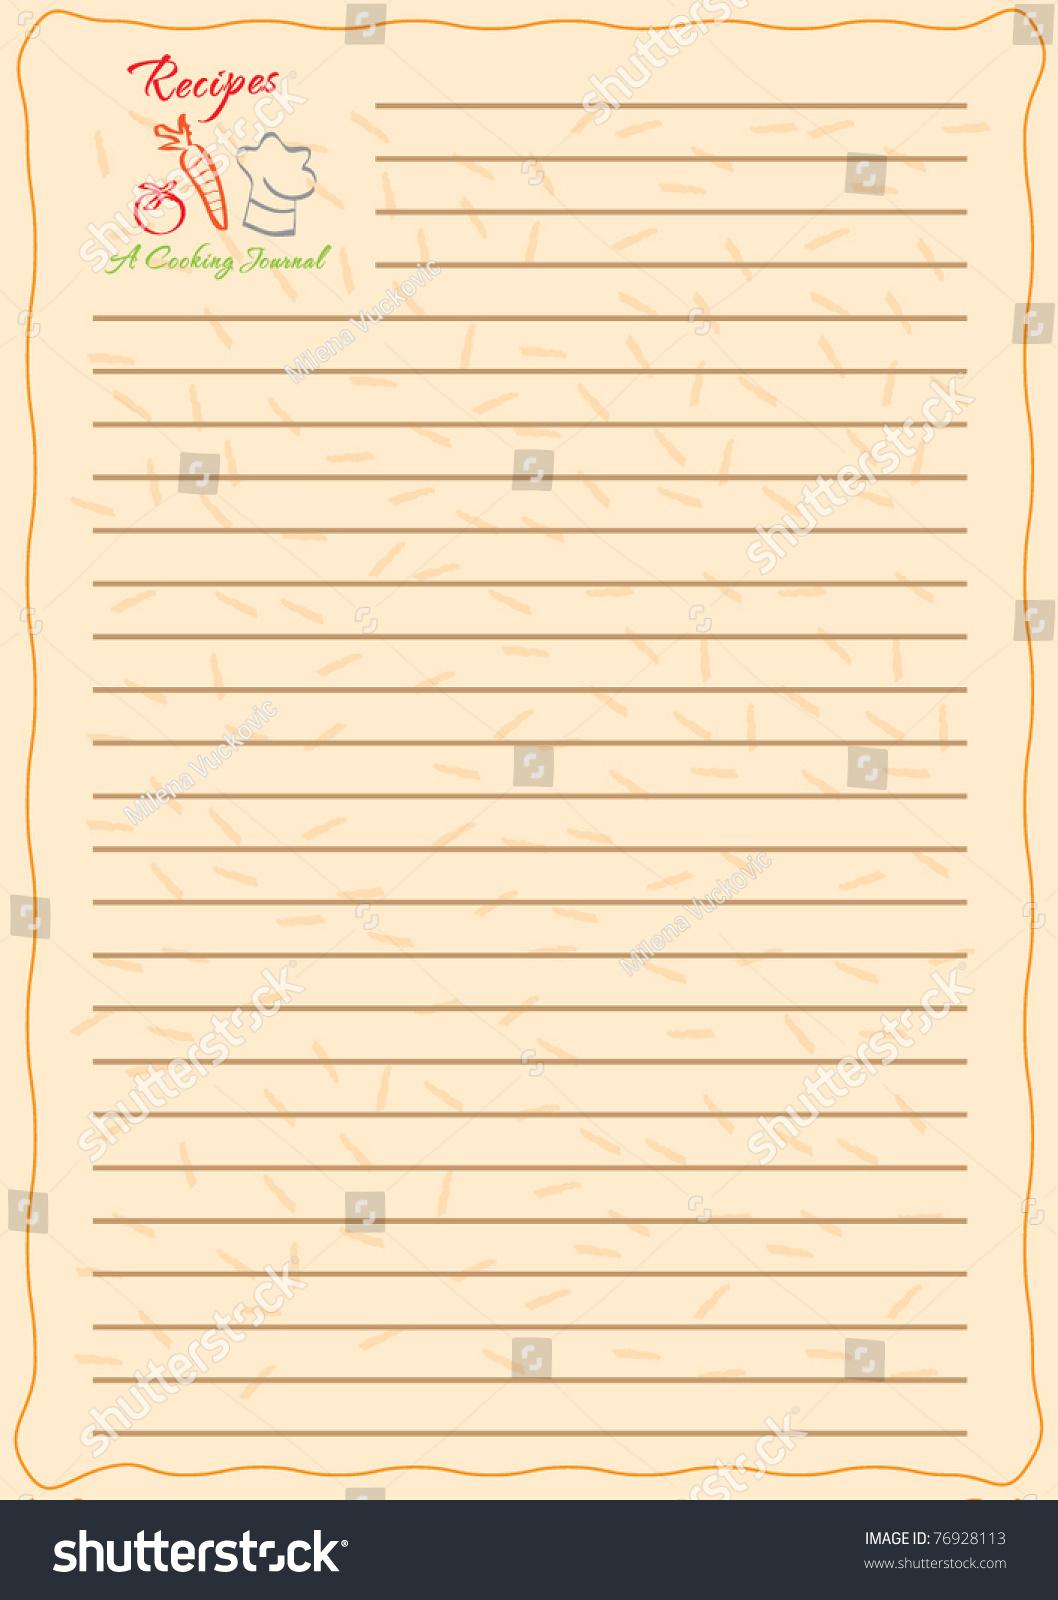 template frame design recipe book vector stock vector 76928113 shutterstock. Black Bedroom Furniture Sets. Home Design Ideas